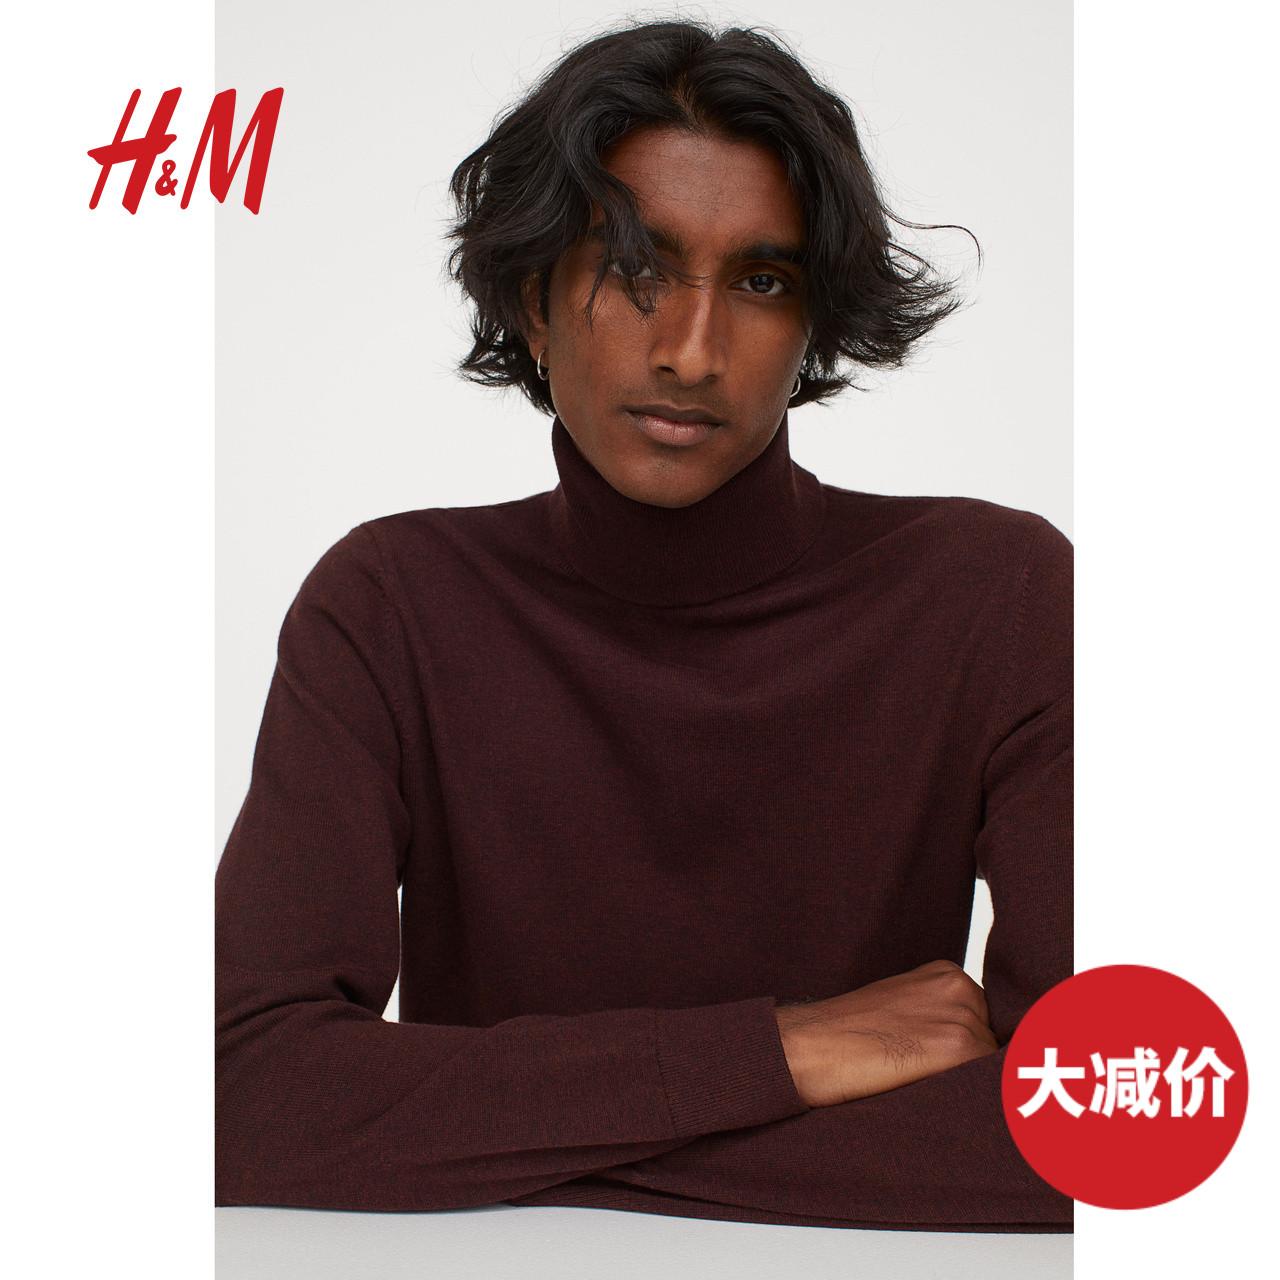 HM Men's Men's Turtleneck Sweater 2020 Fall/Winter New Style Inner Base Shirt Long Sleeve Knitwear 0715828